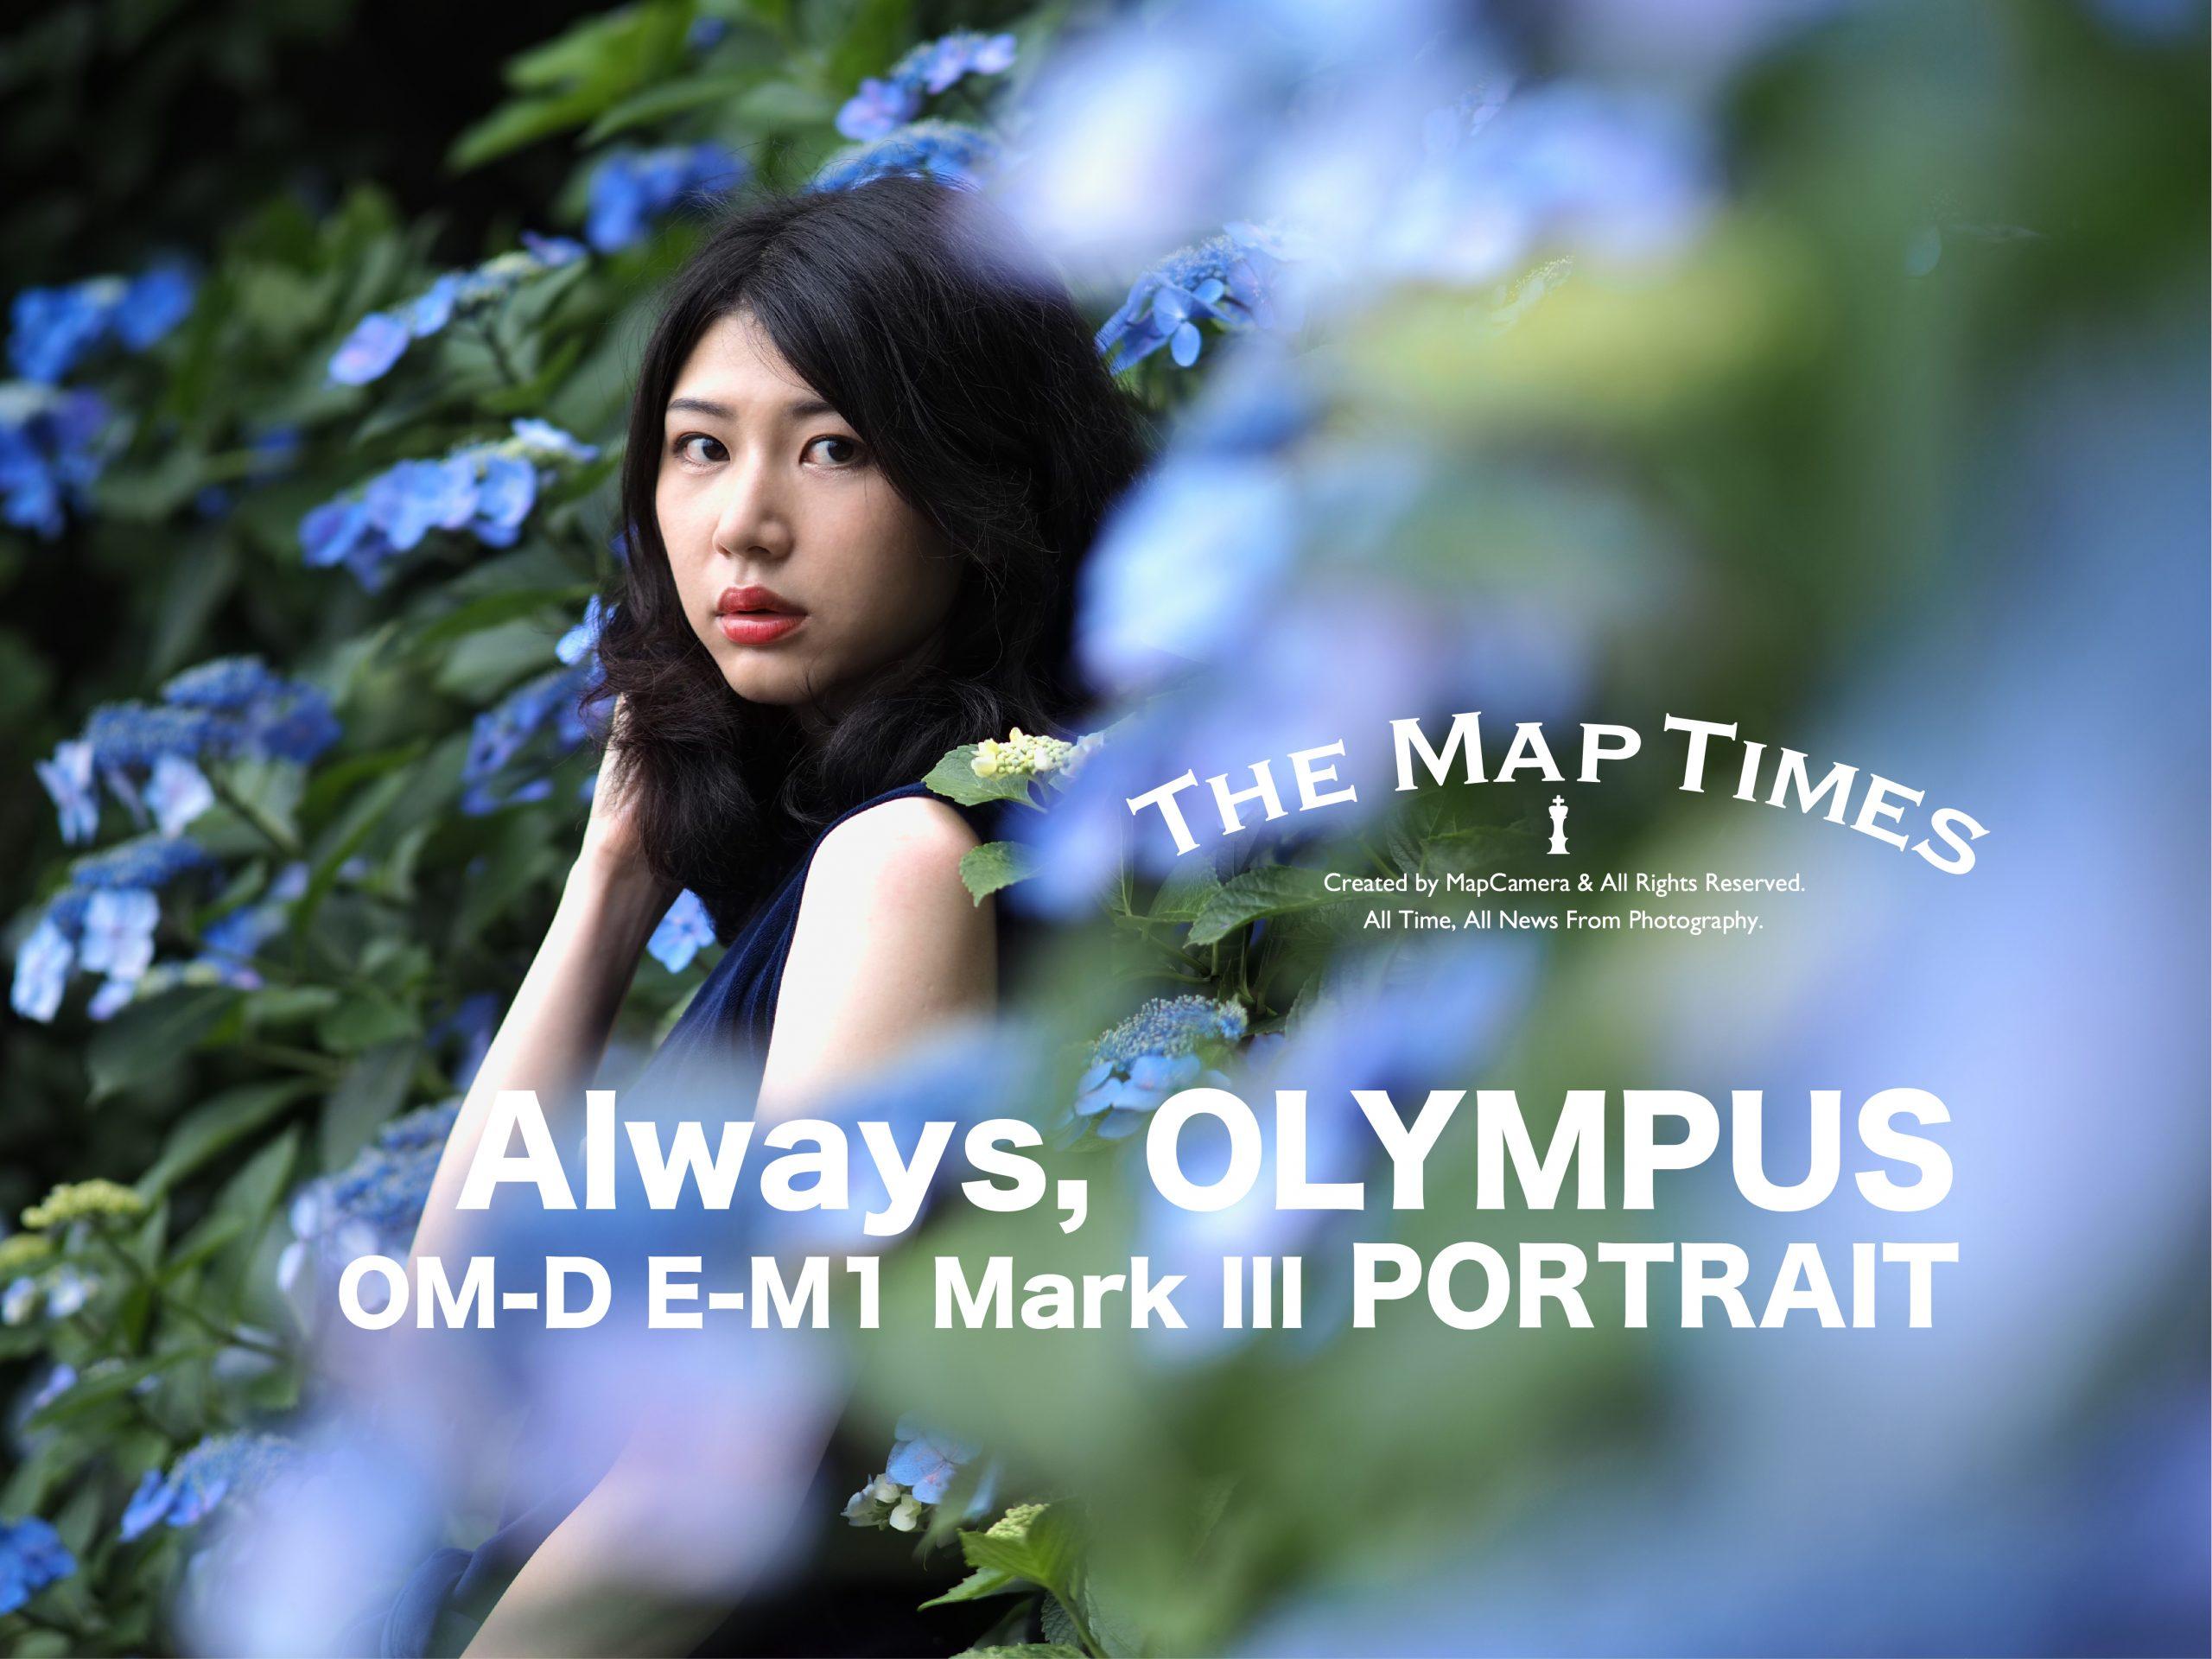 【OLYMPUS】Always, OLYMPUS Ver. OM-D E-M1 Mark III